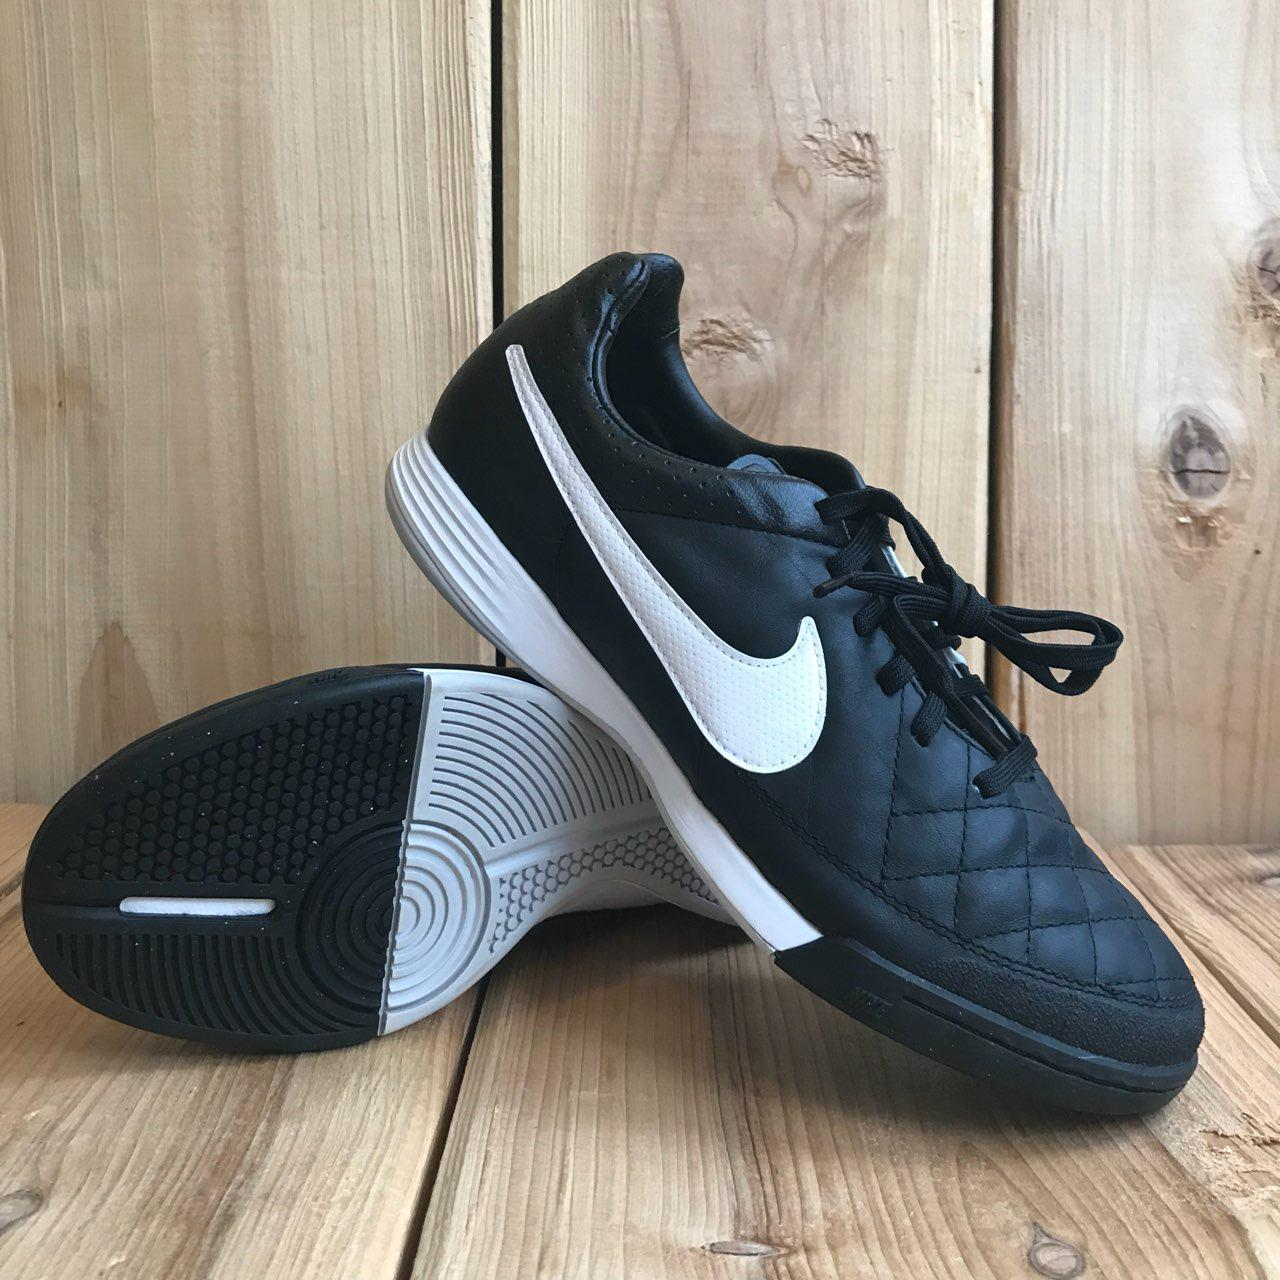 95d1c210 Футзалки Nike Tiempo Legacy IC 631522-010 (Оригинал) Sale - Football Mall -